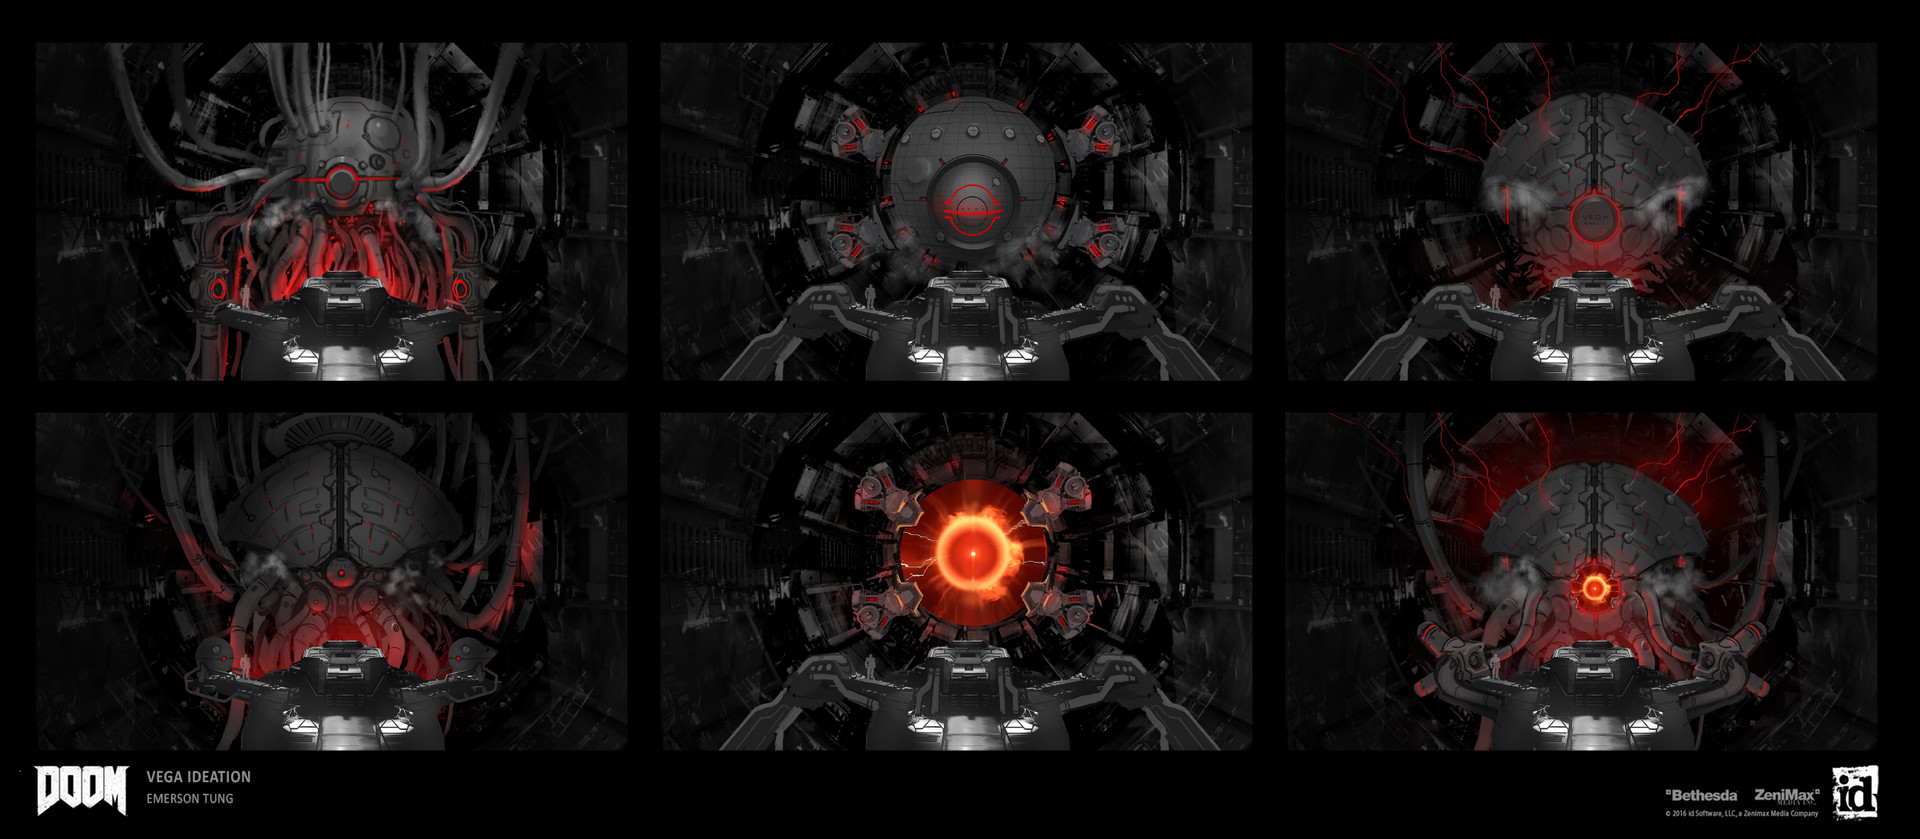 Emerson Tung Doom Vega